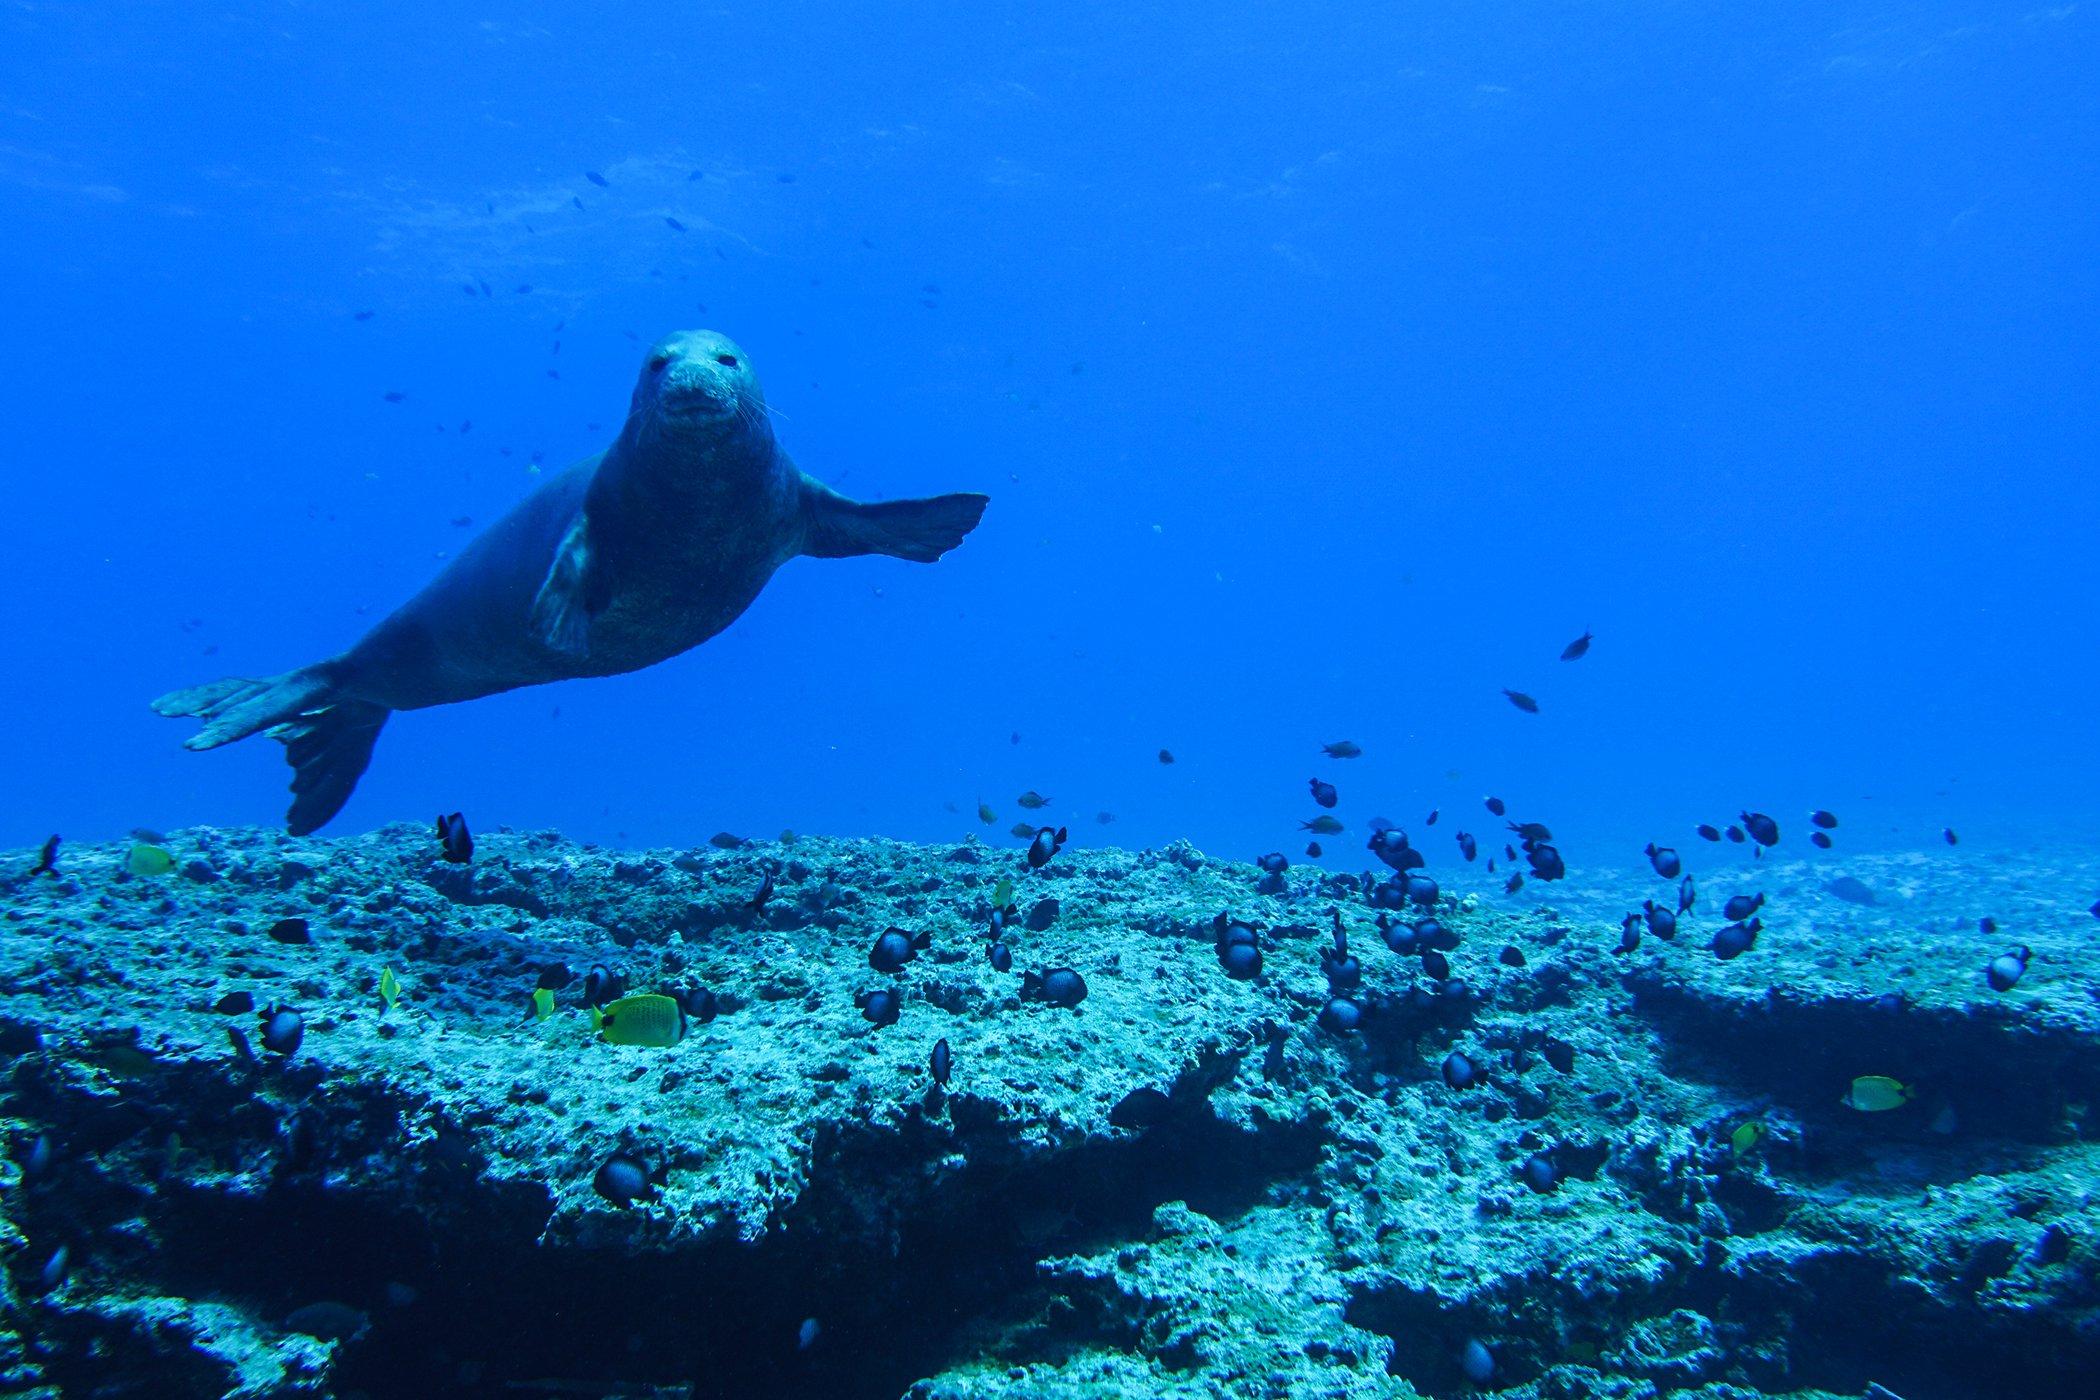 Biodiversity-Protect-Oceans-Papahanaumokuakea Marine National Monument.jpg